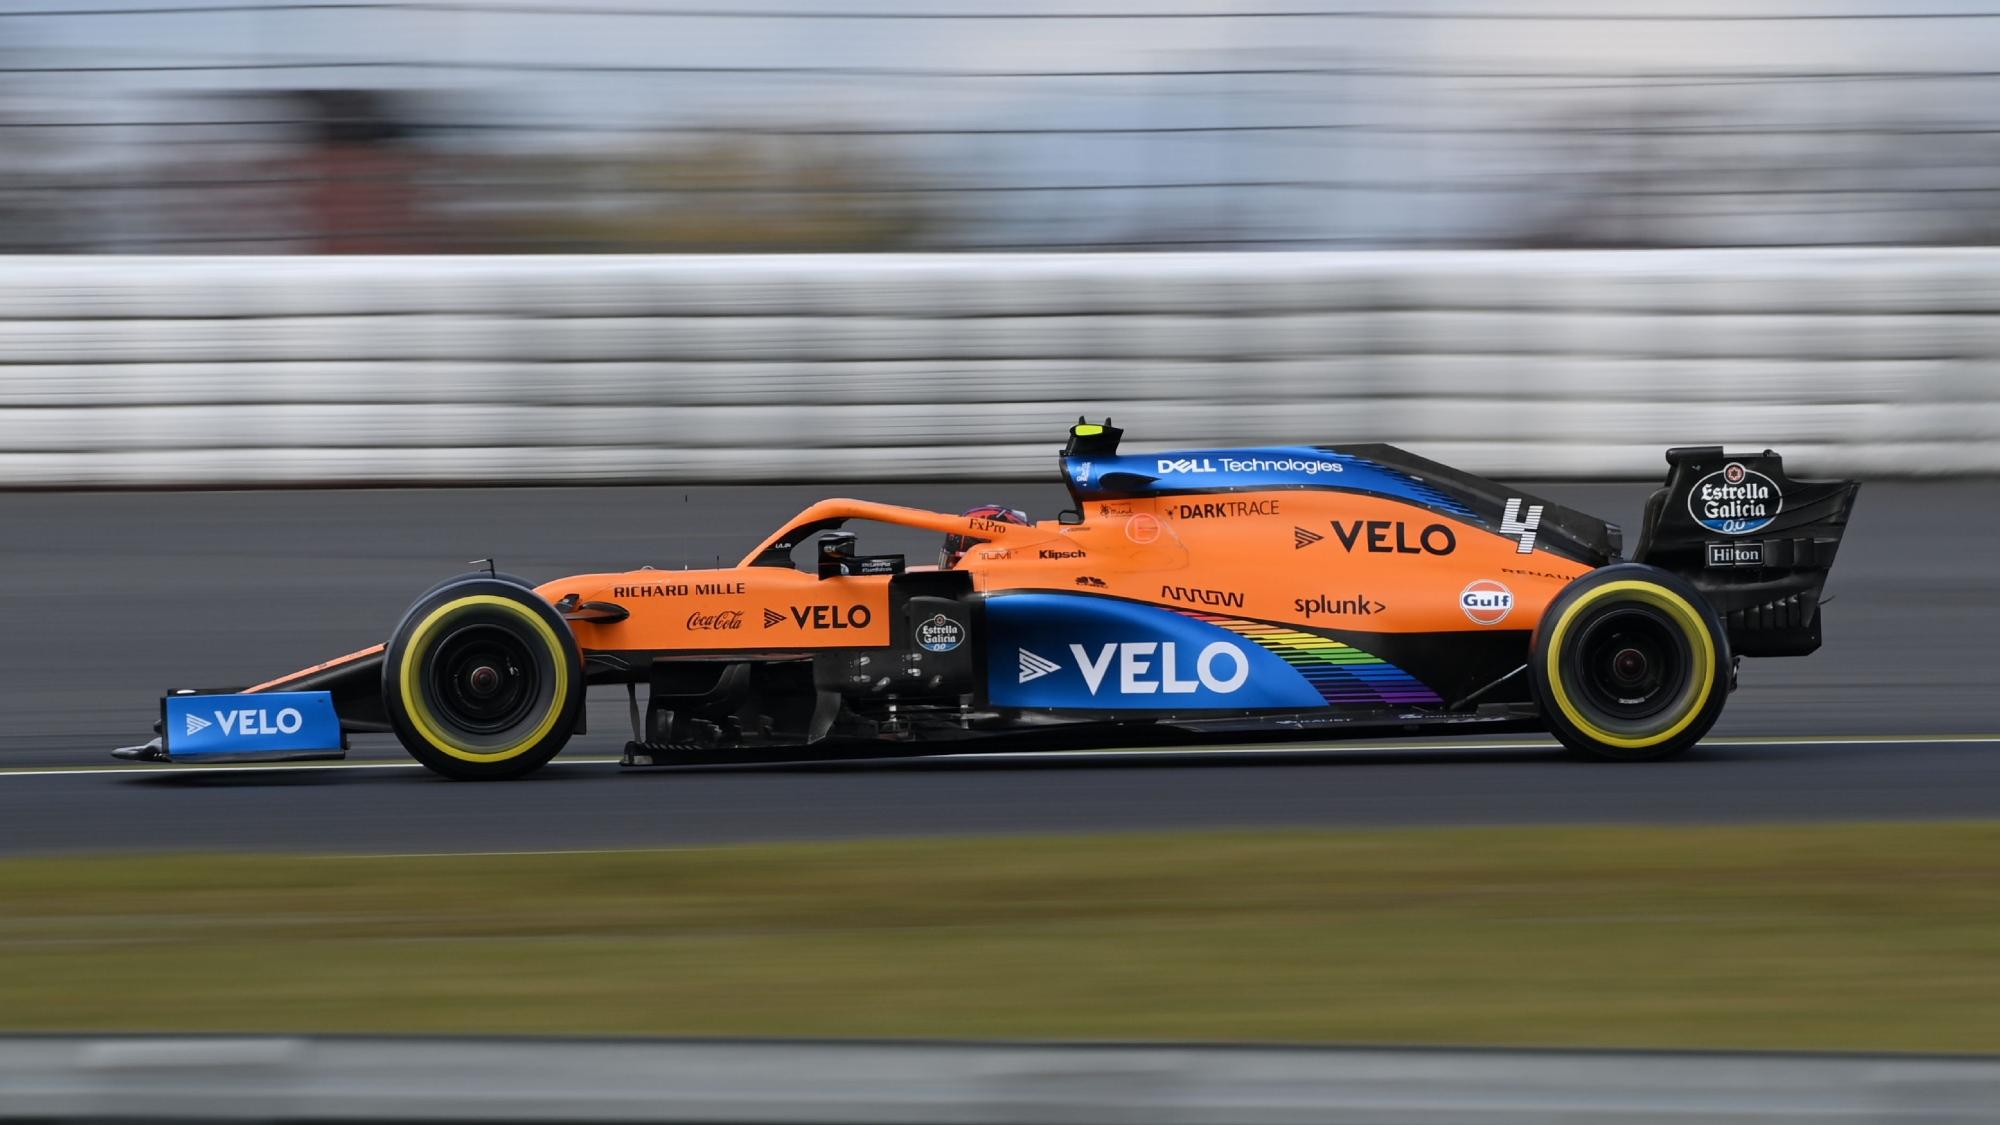 Lando Norris, 2020 Eifel GP